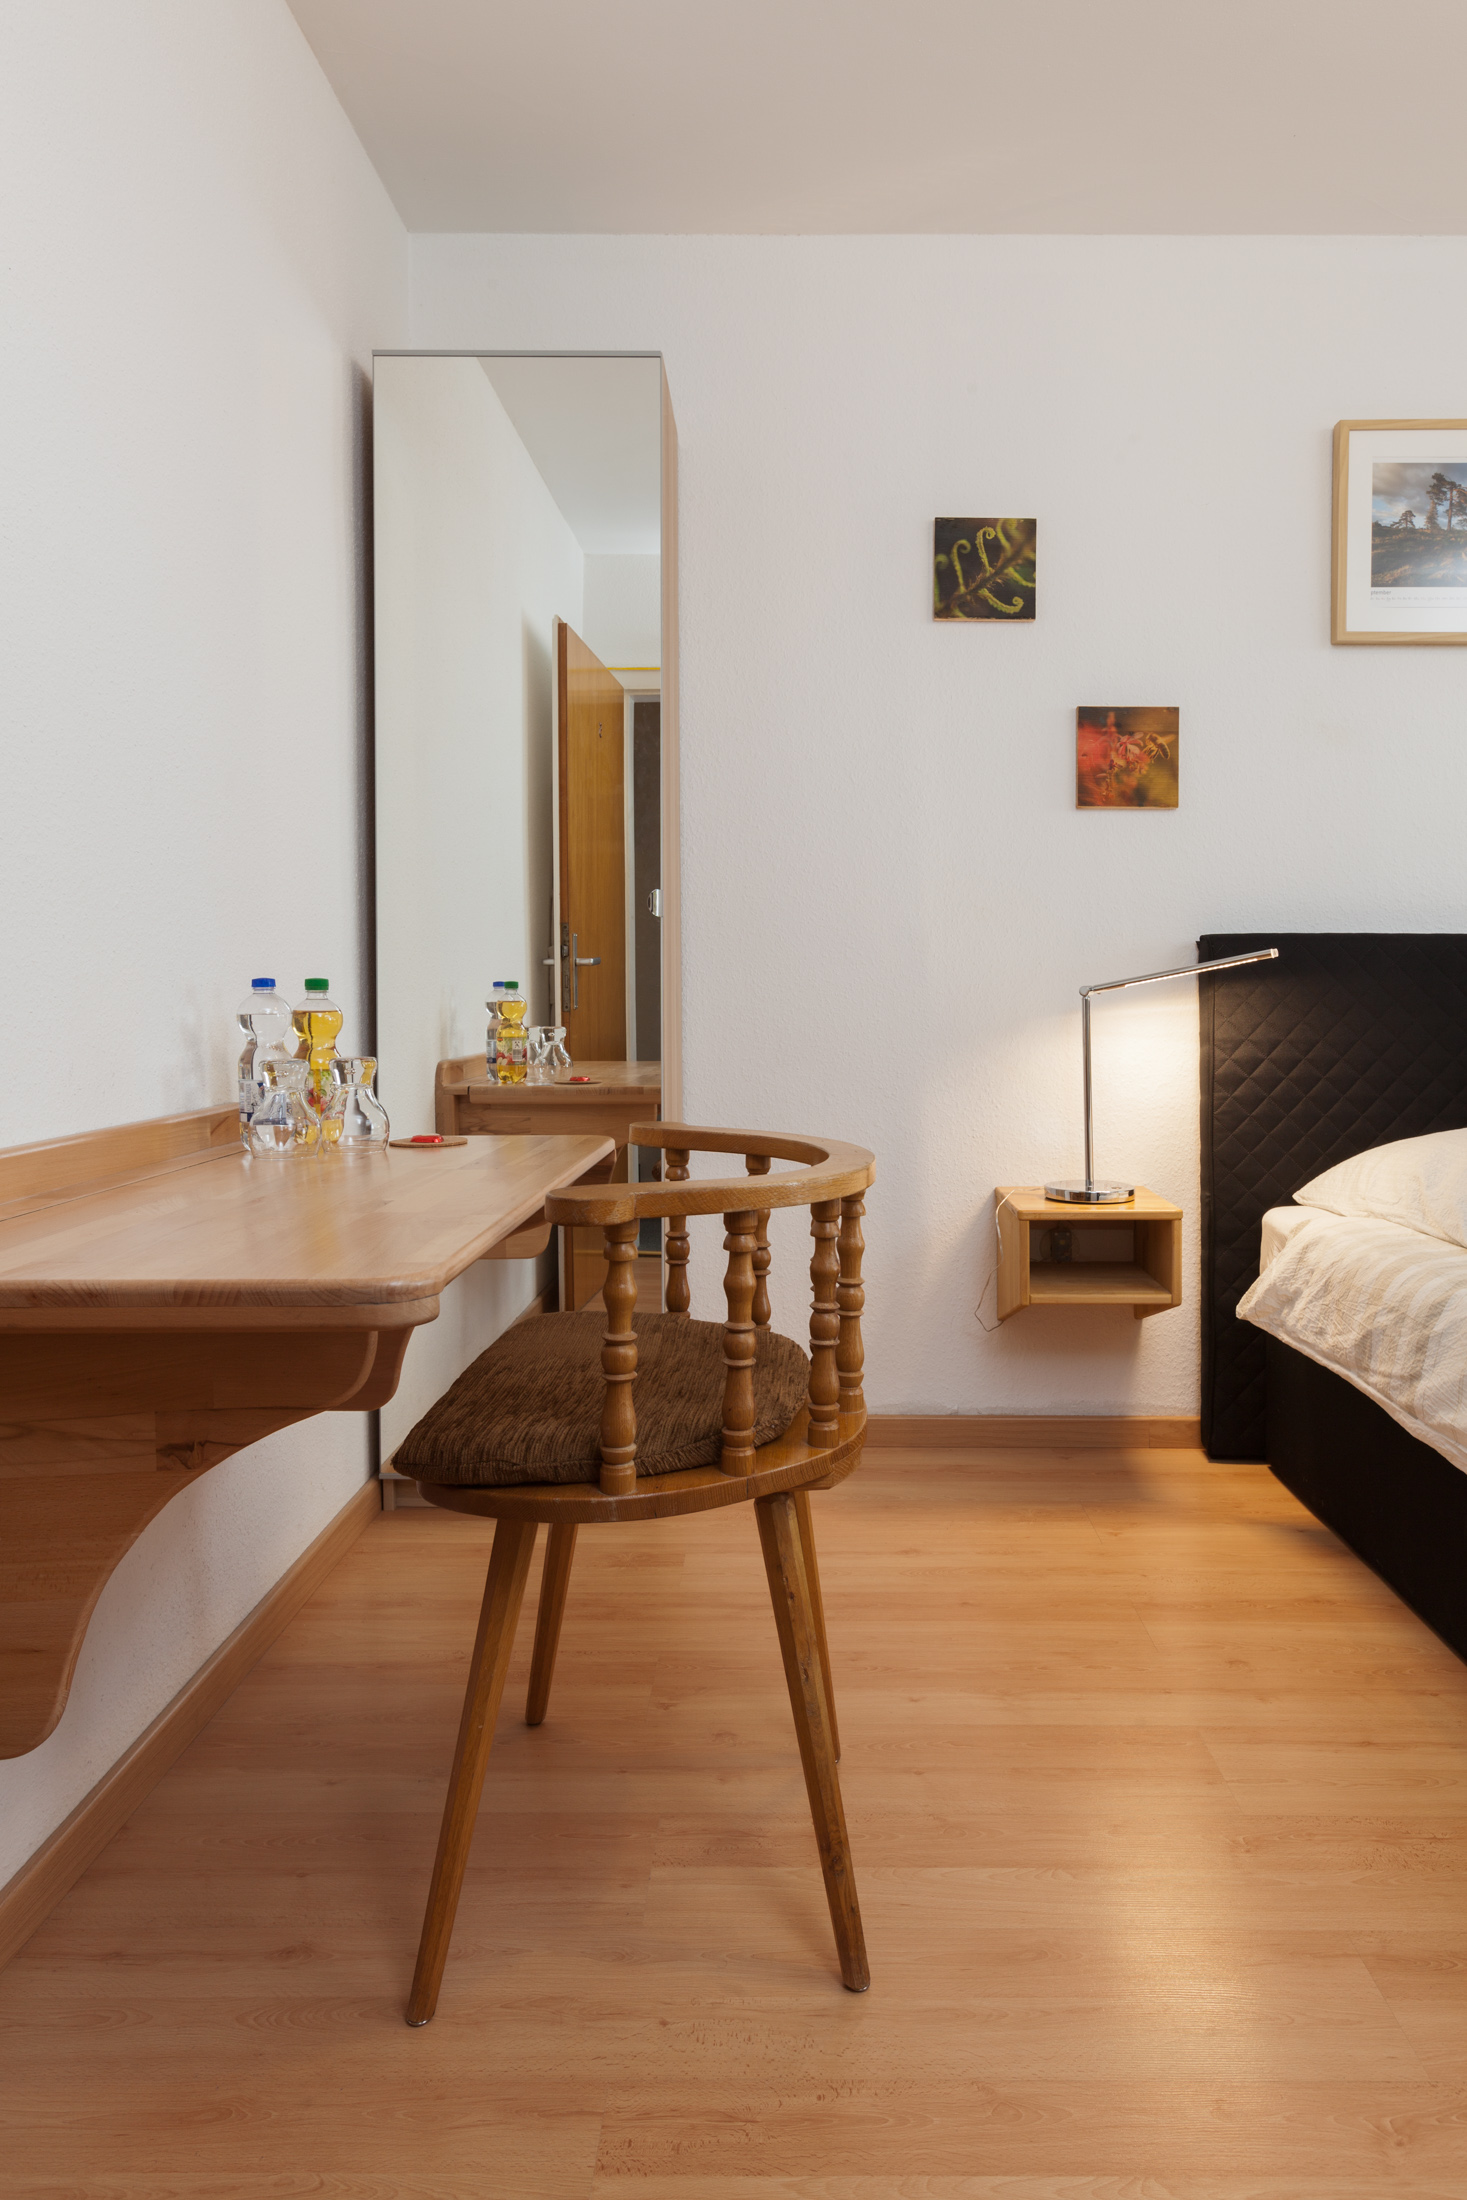 Double room with balcony #5 / Shared bathroom